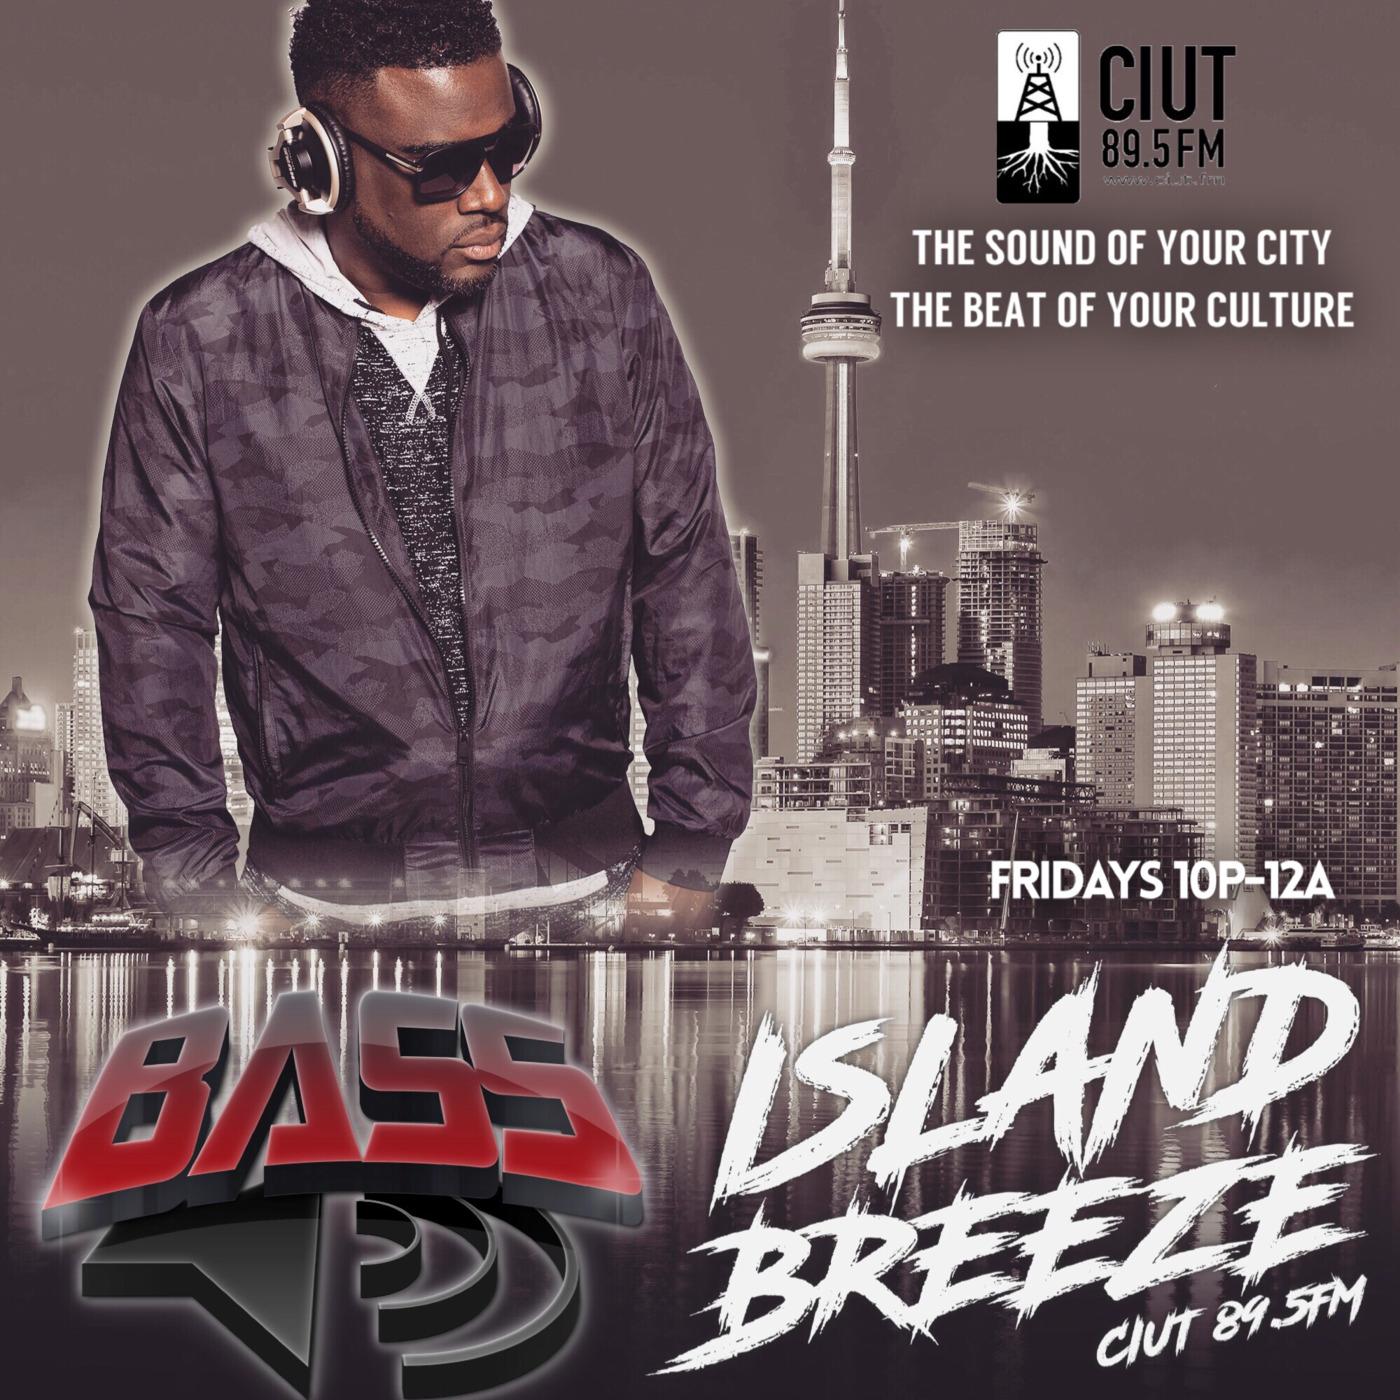 DJ BASS LIVE - Island Breeze 89 5fm Island Breeze With DJ